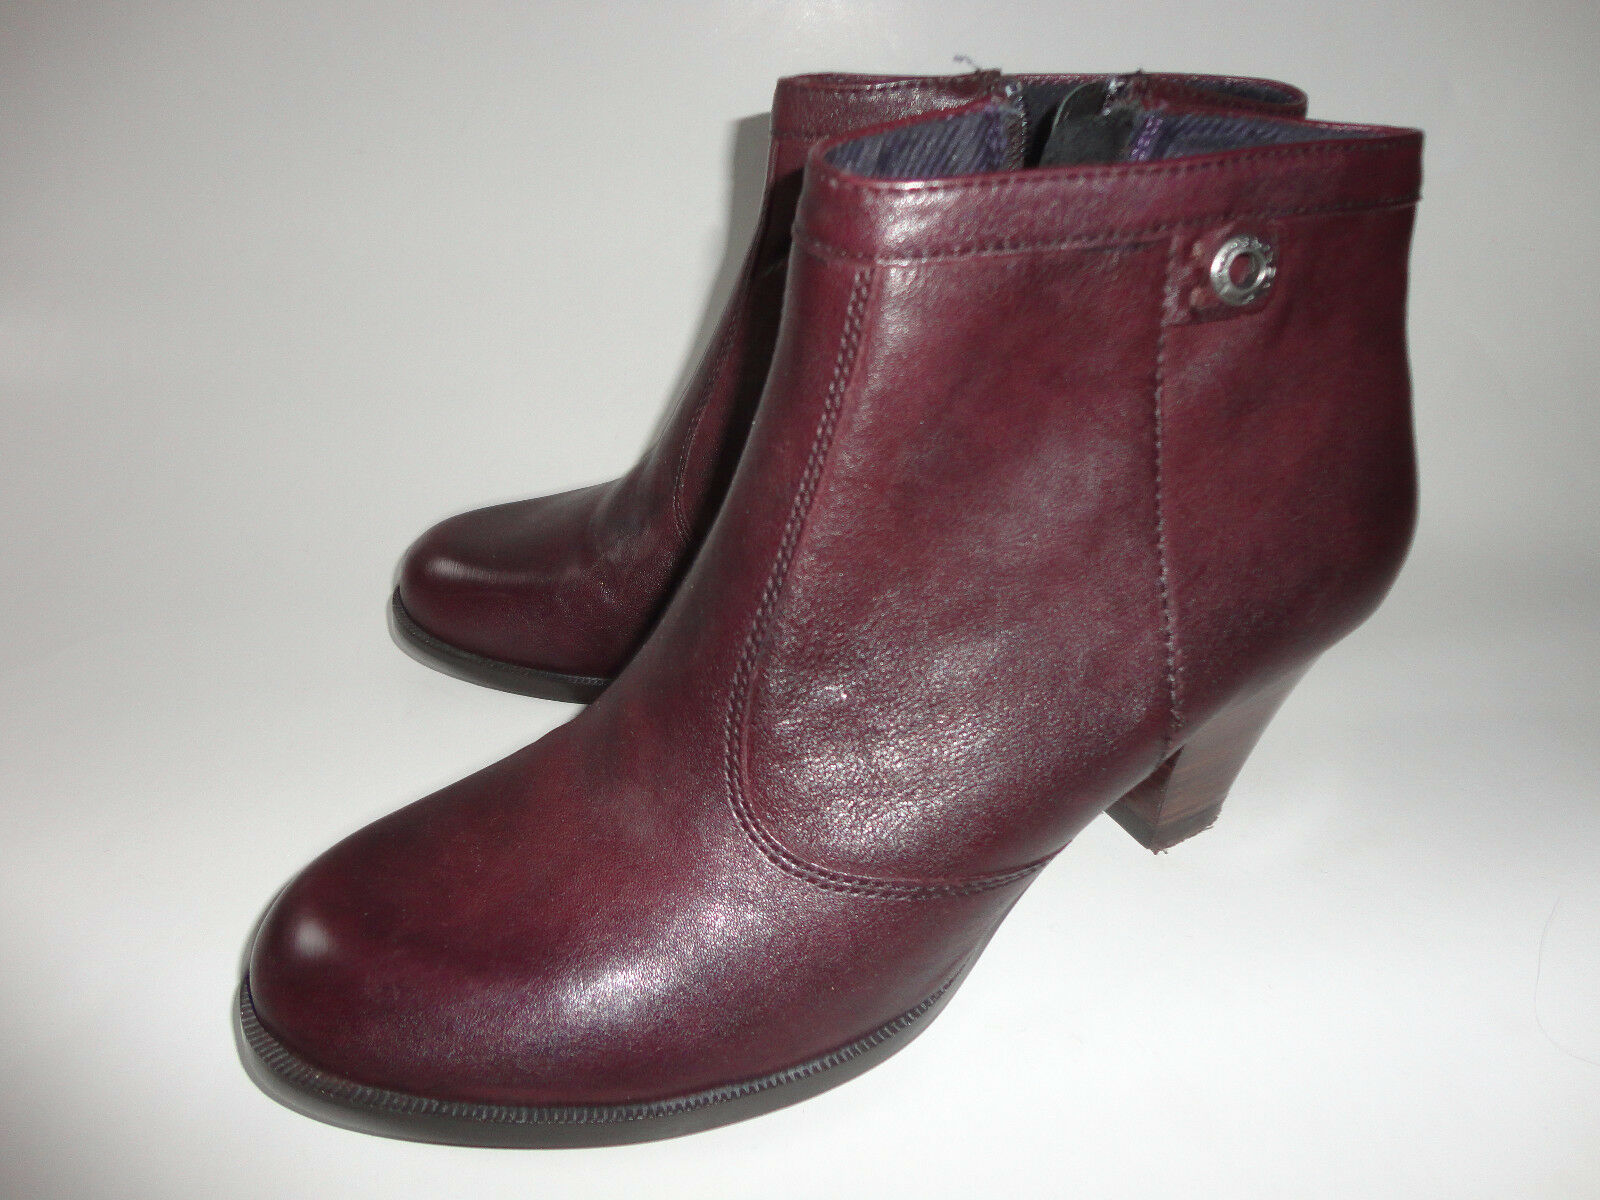 Vagabond Damen Leder- Jacke Stiefel Stiefelette Schuhe Gr.41 weinrot zu Jacke Leder- 28f4f7